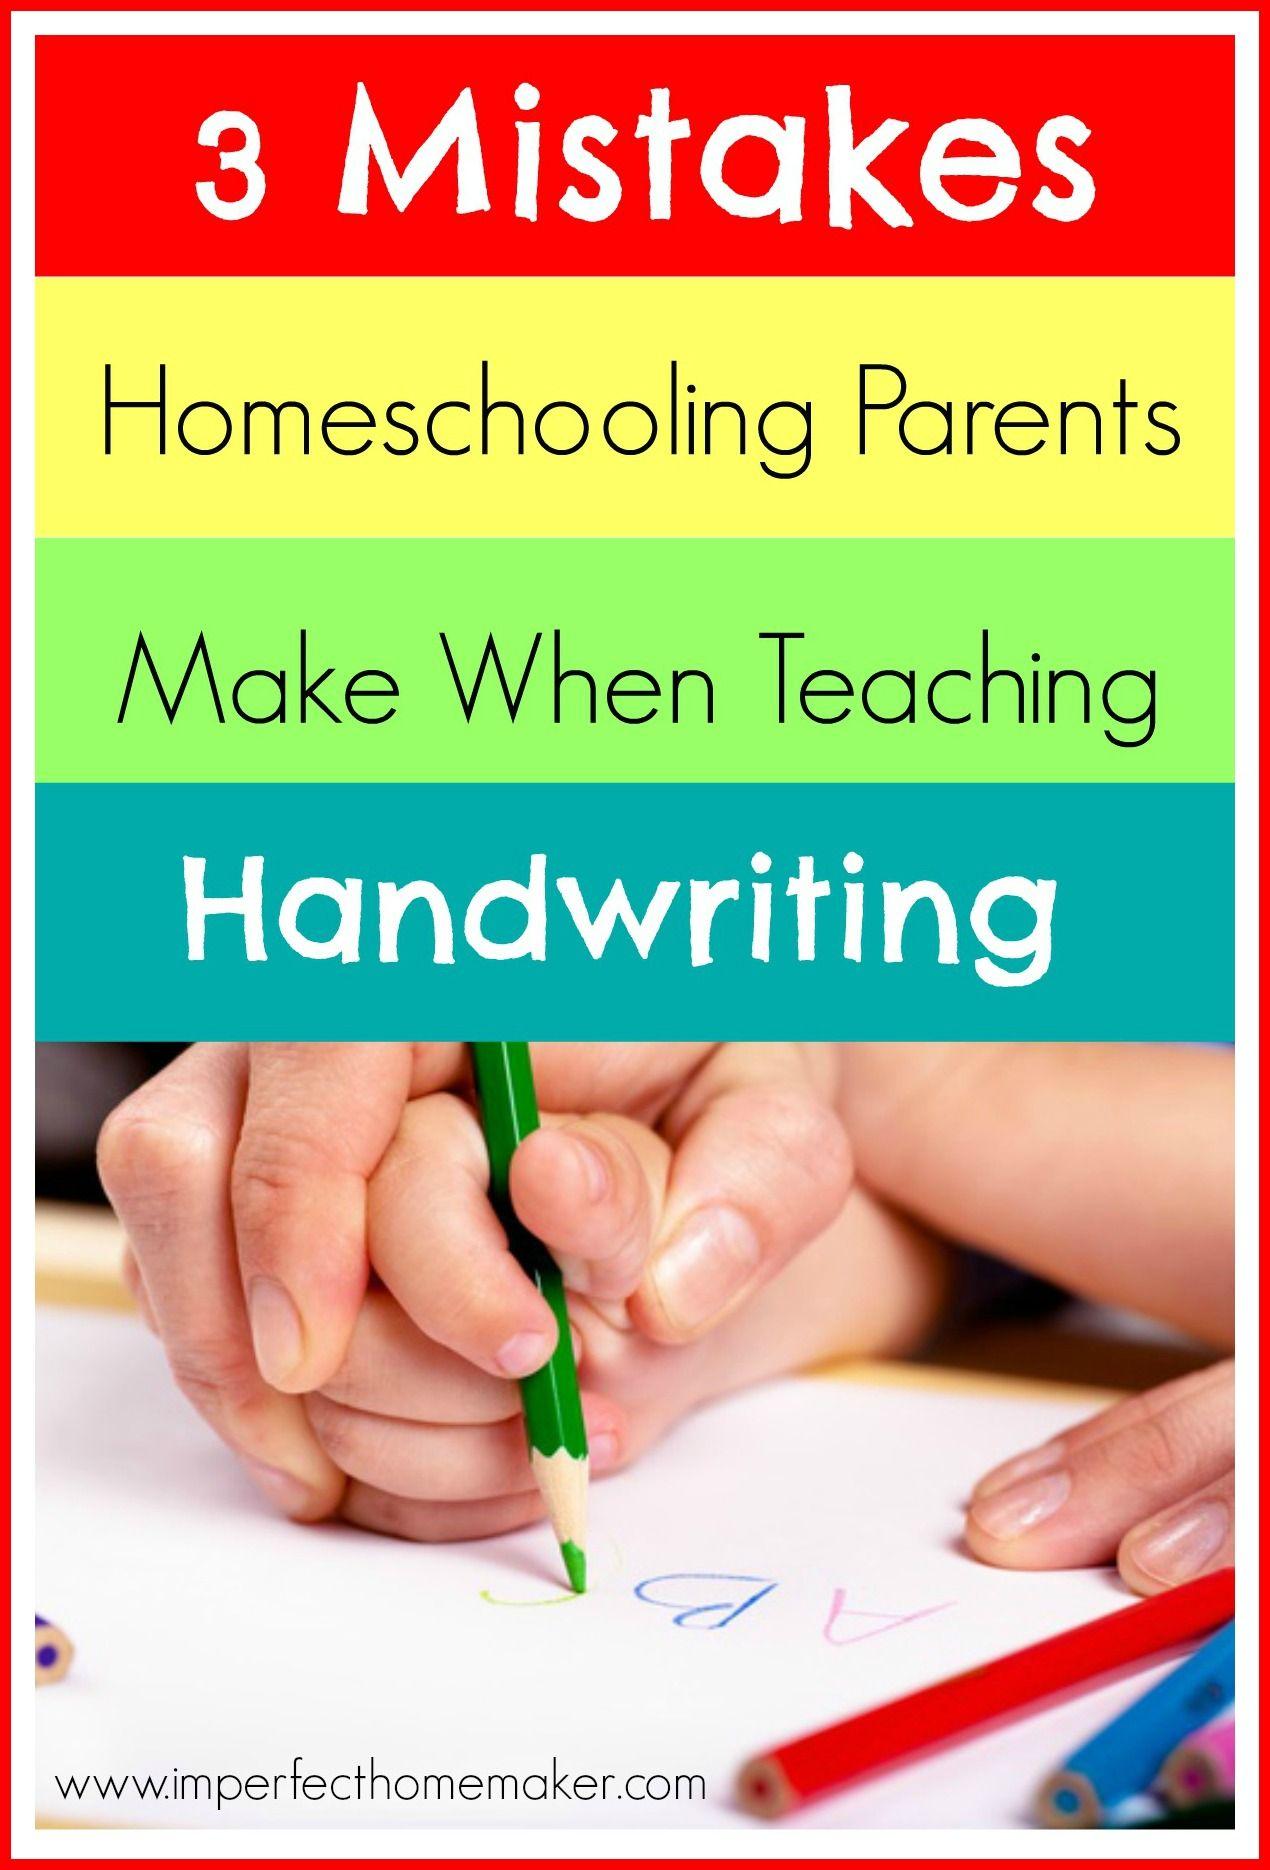 3 Mistakes Homeschooling Parents Make When Teaching Handwriting ...